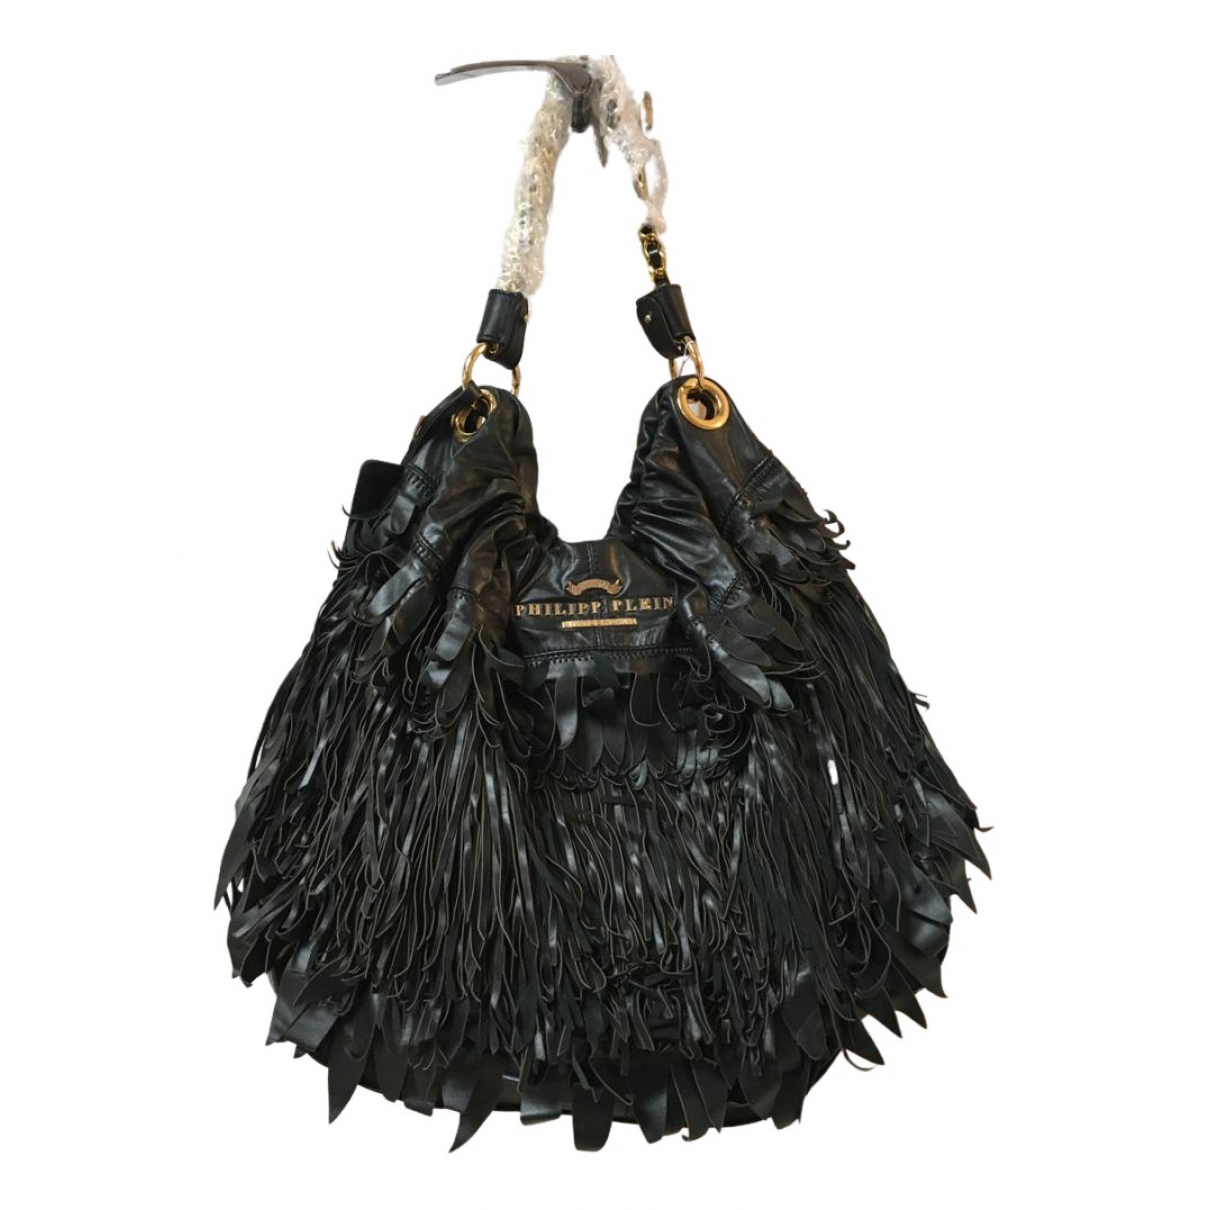 Philipp Plein N Black Leather handbag for Women N